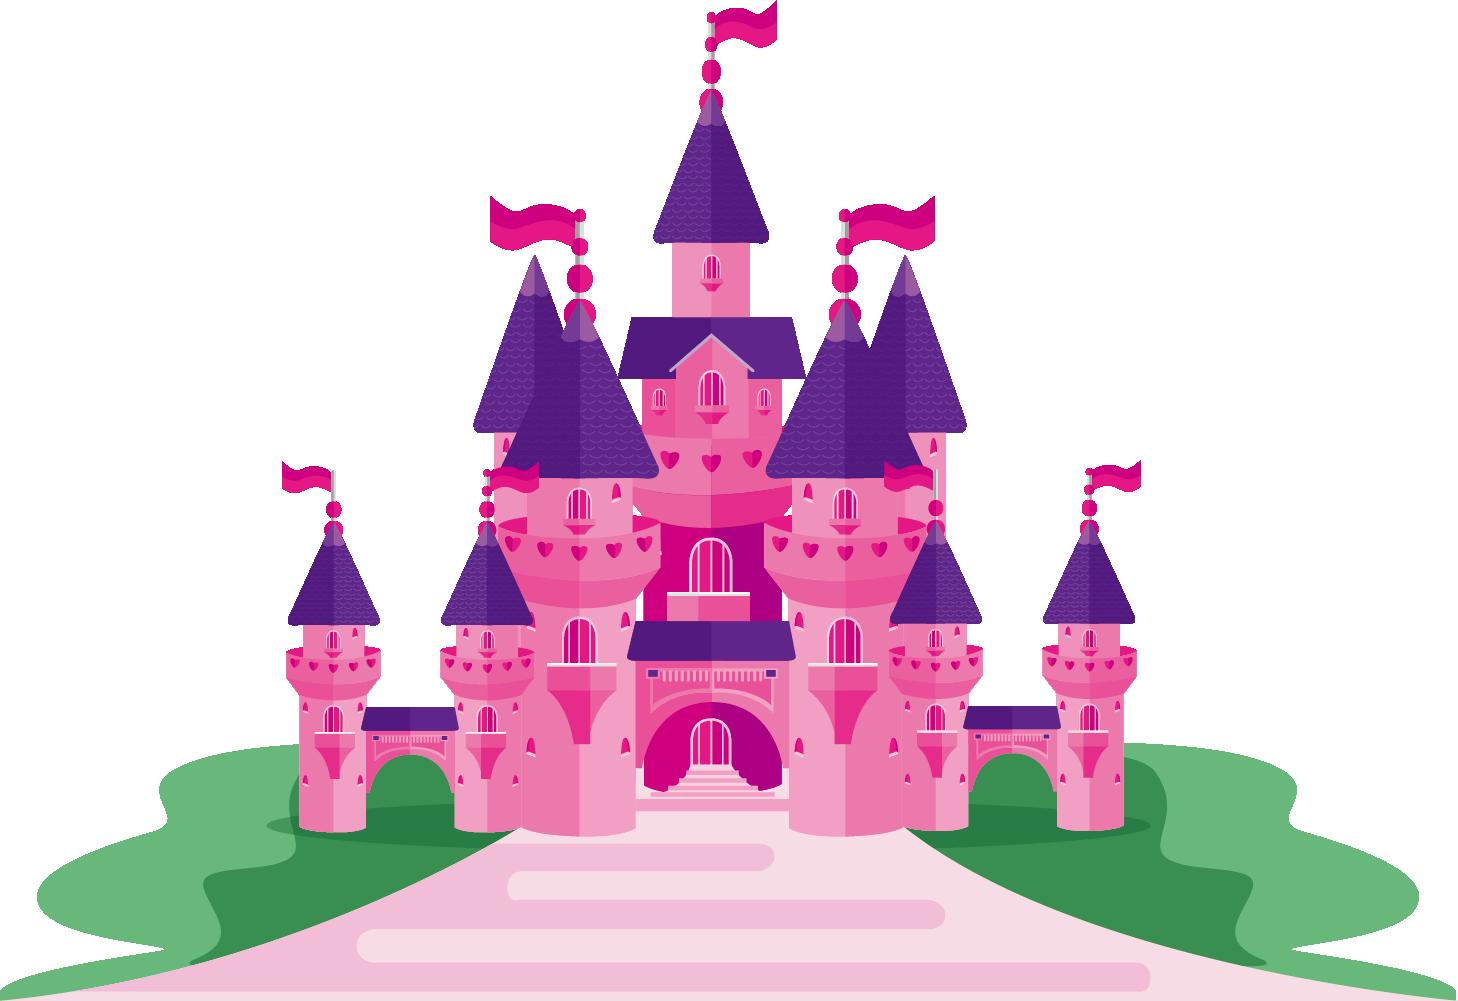 Palace clipart pink castle. Princess jasmine cinderella imperial